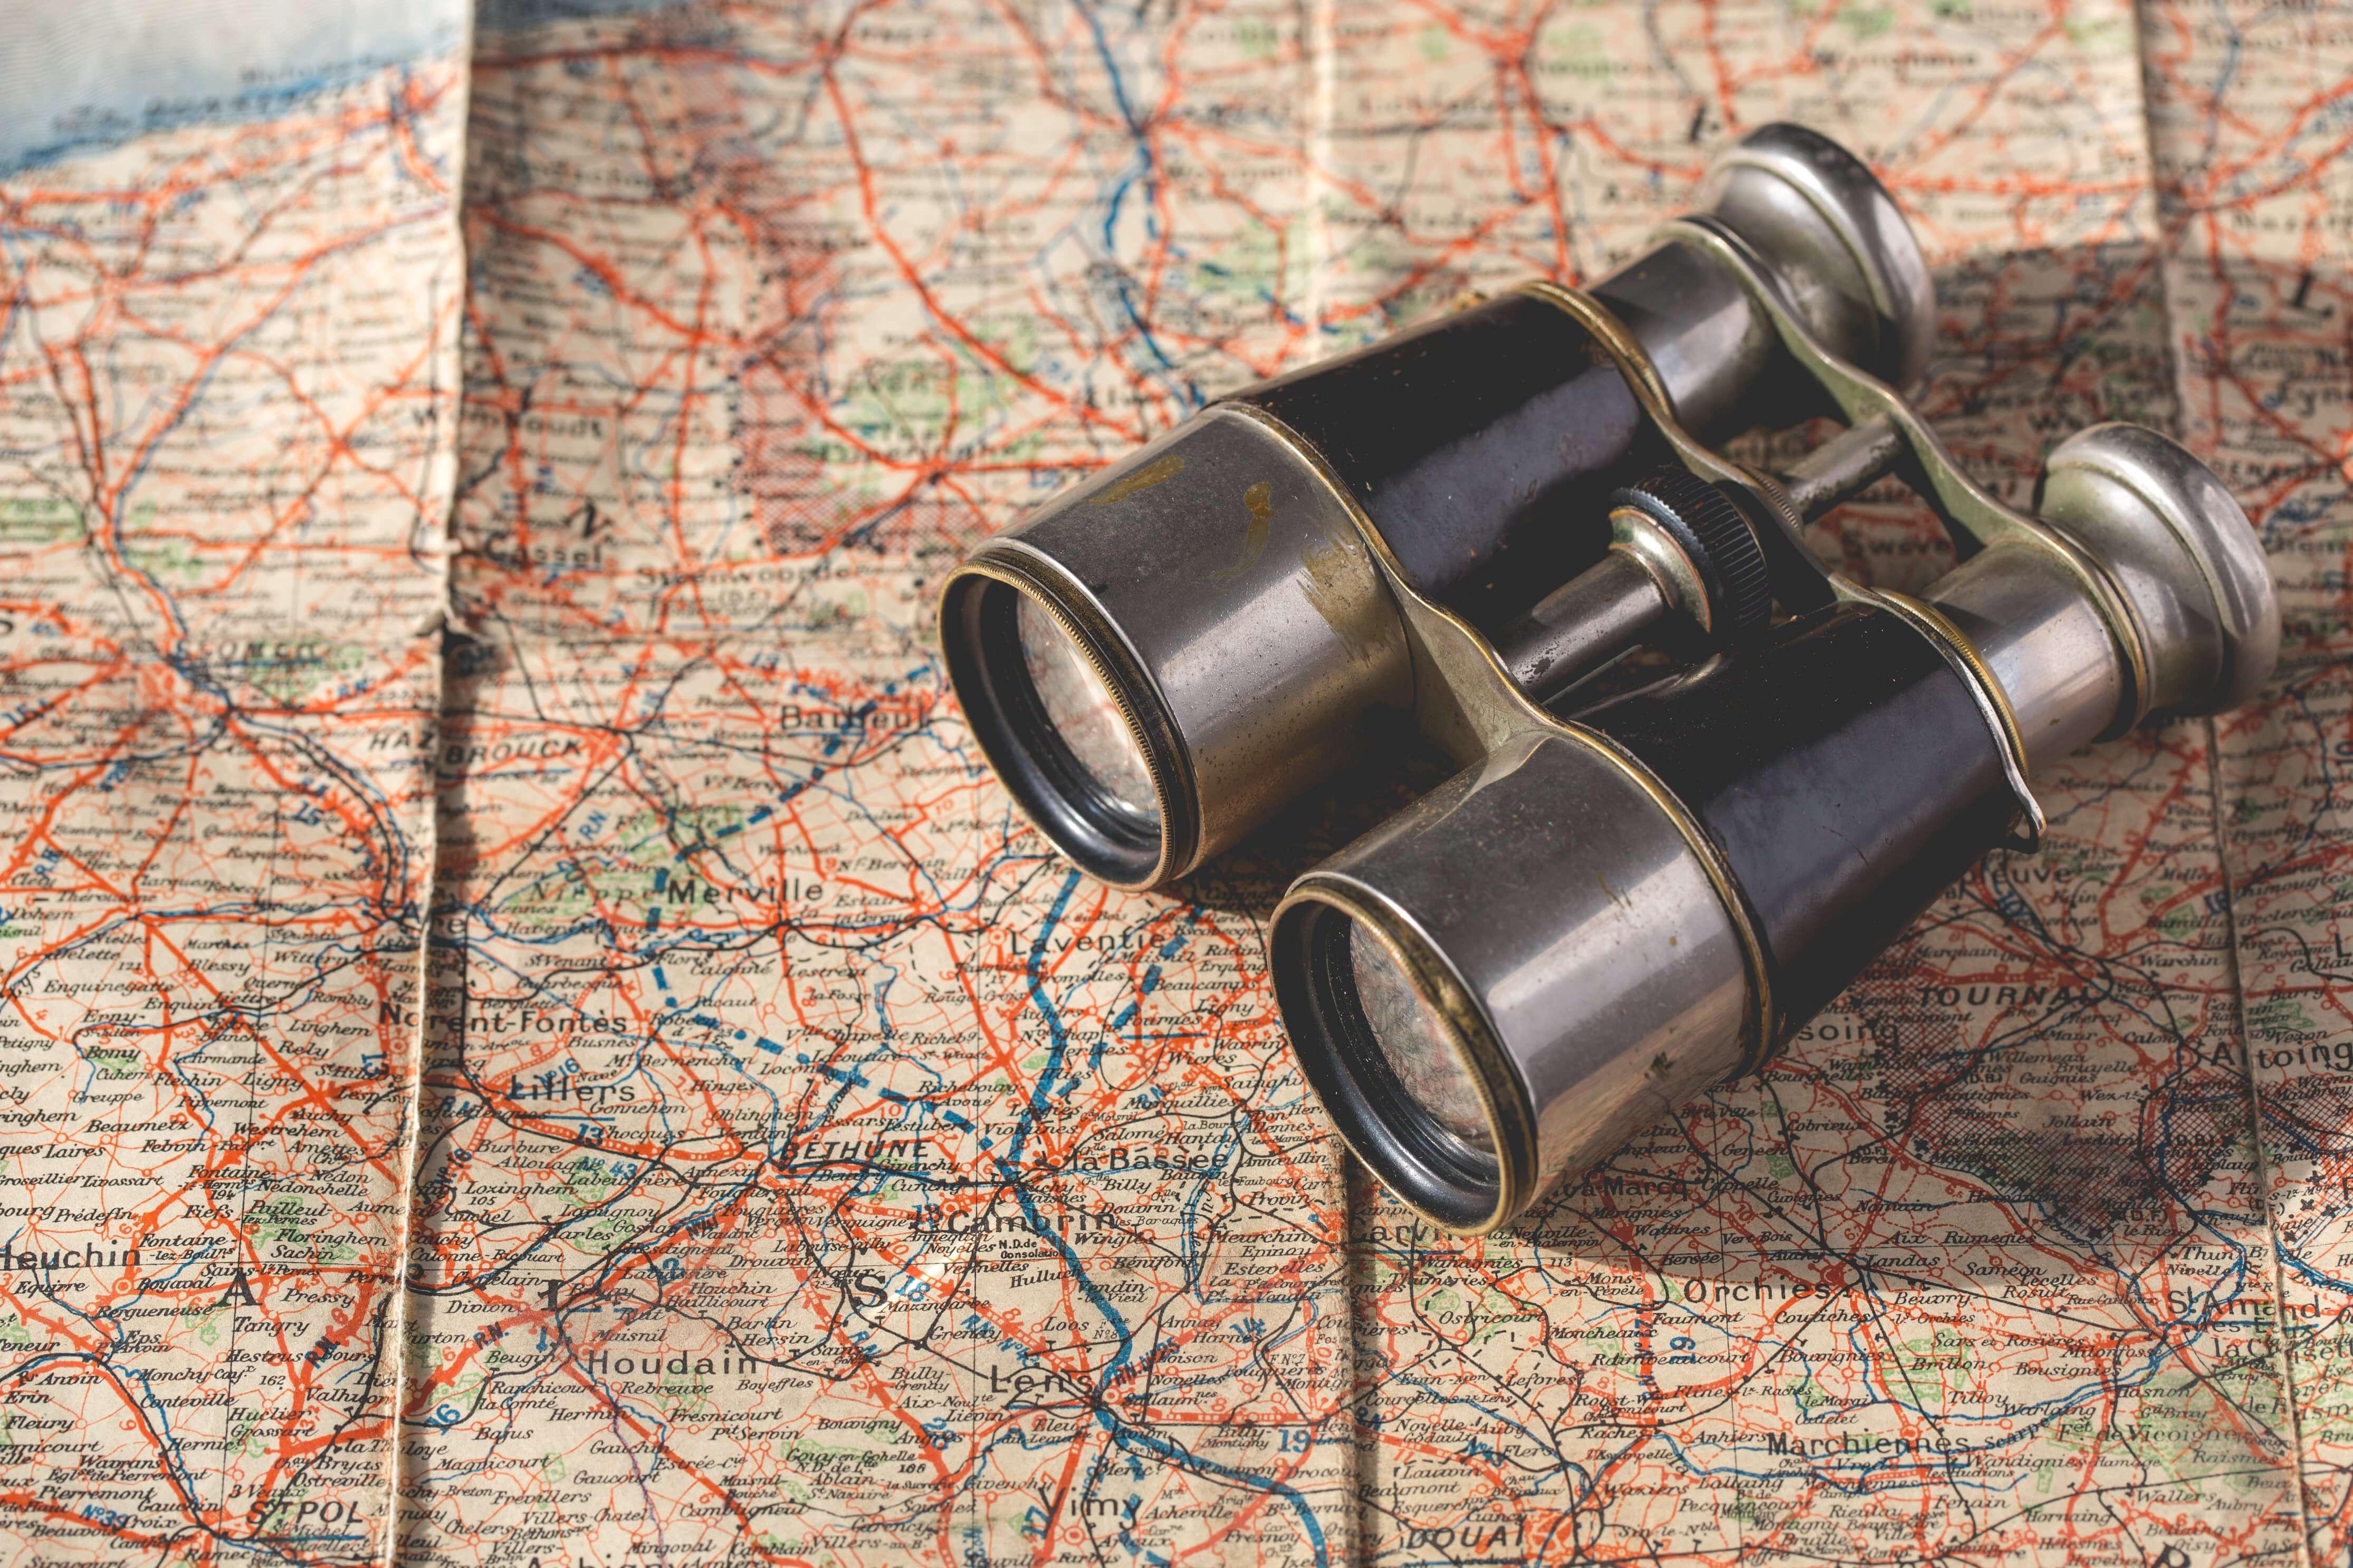 Binoculars on a map